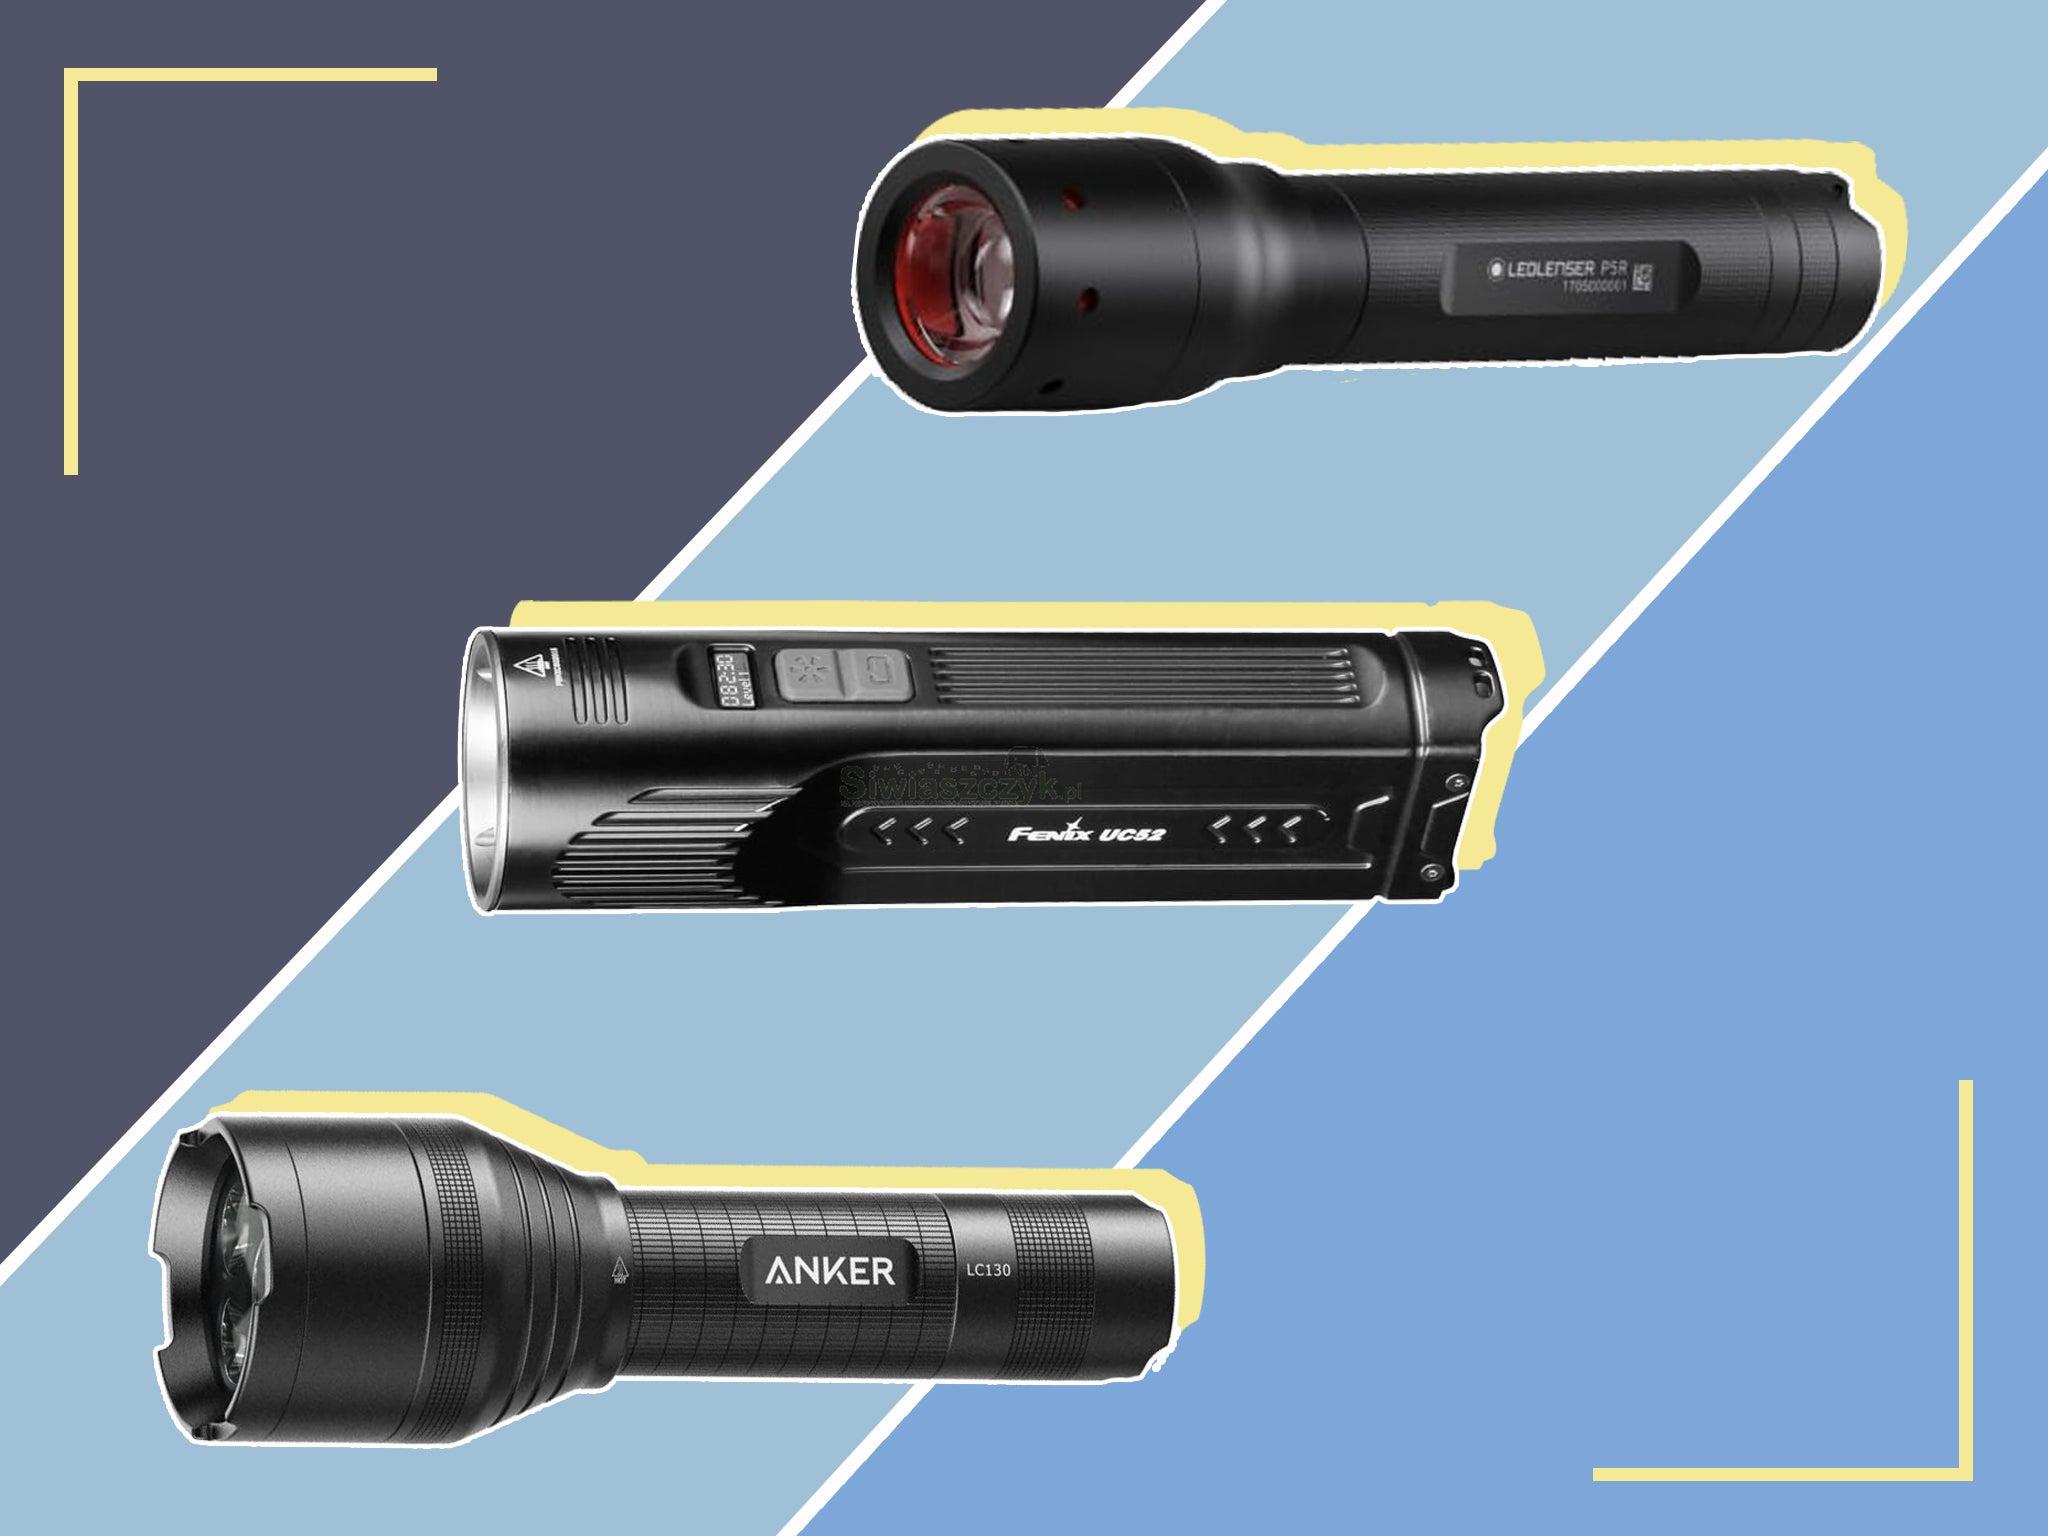 Travel Lightweight Handheld Camping Accessory Ultra Slim LED Aluminium Torch